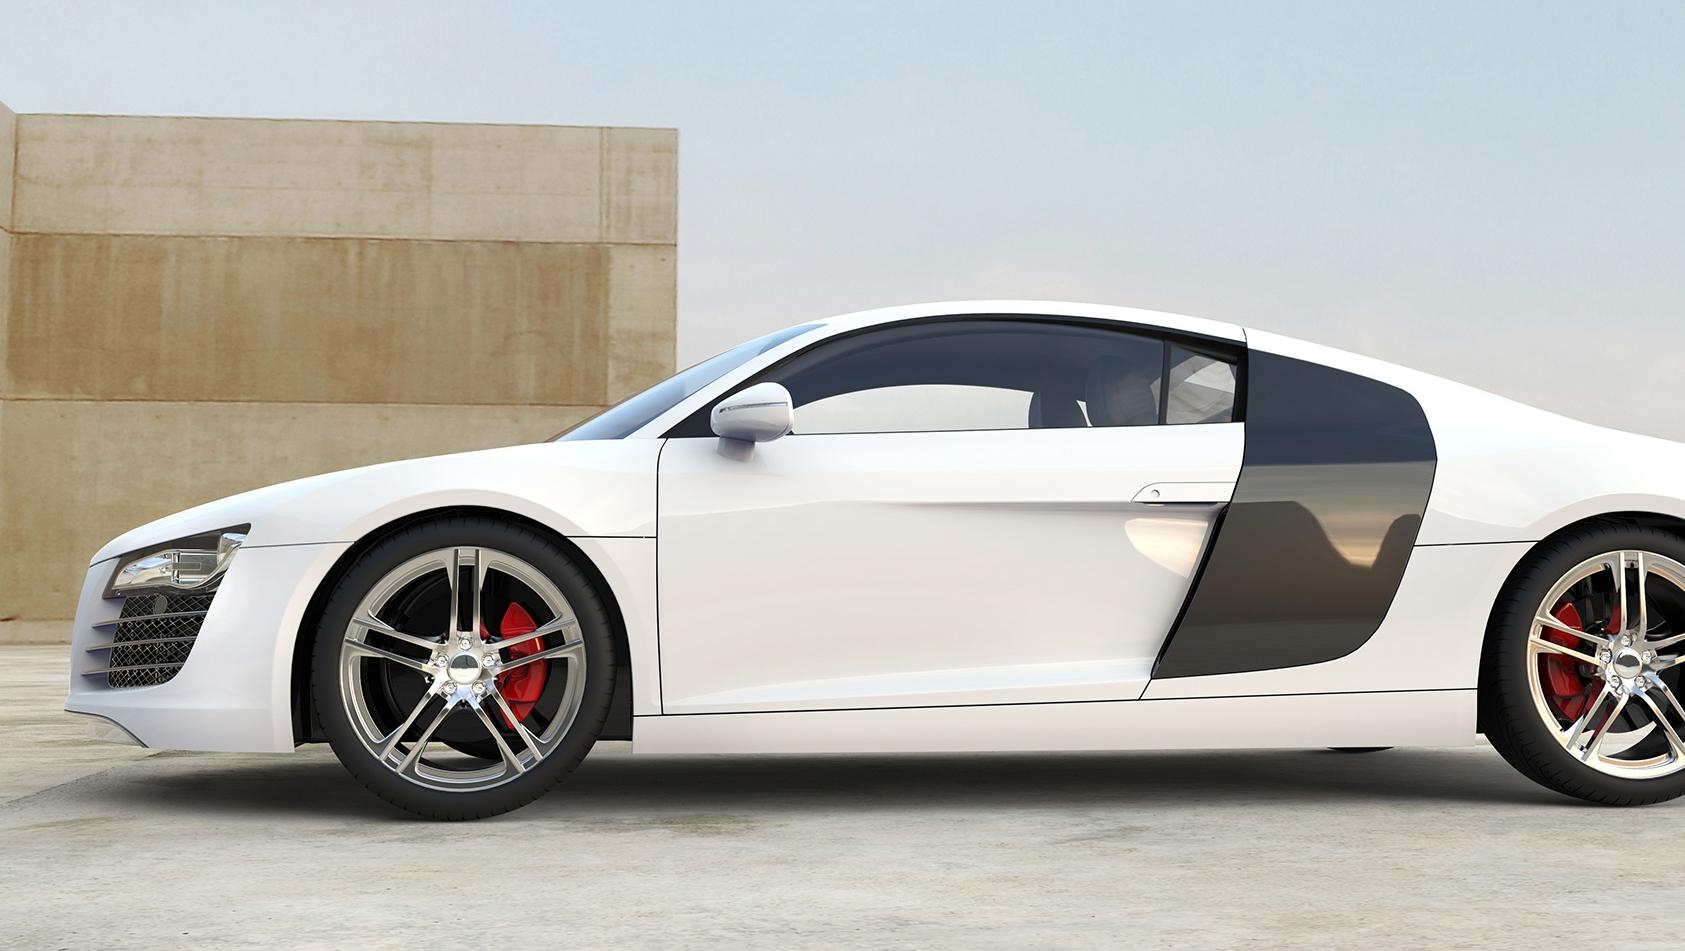 Sacramento Audi Repair & Service - EU-Tech